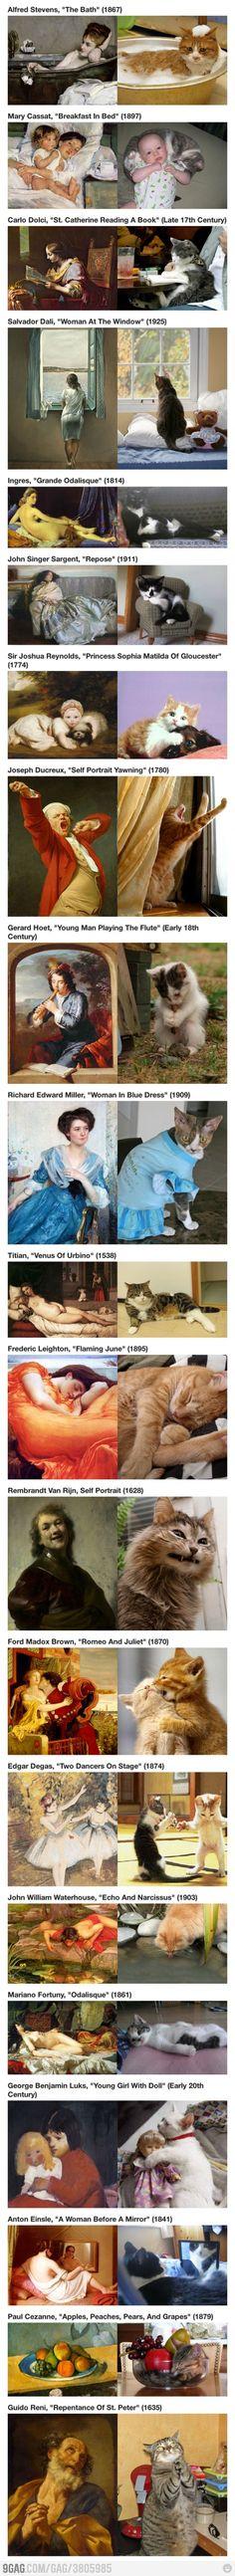 Art Imitating Cats